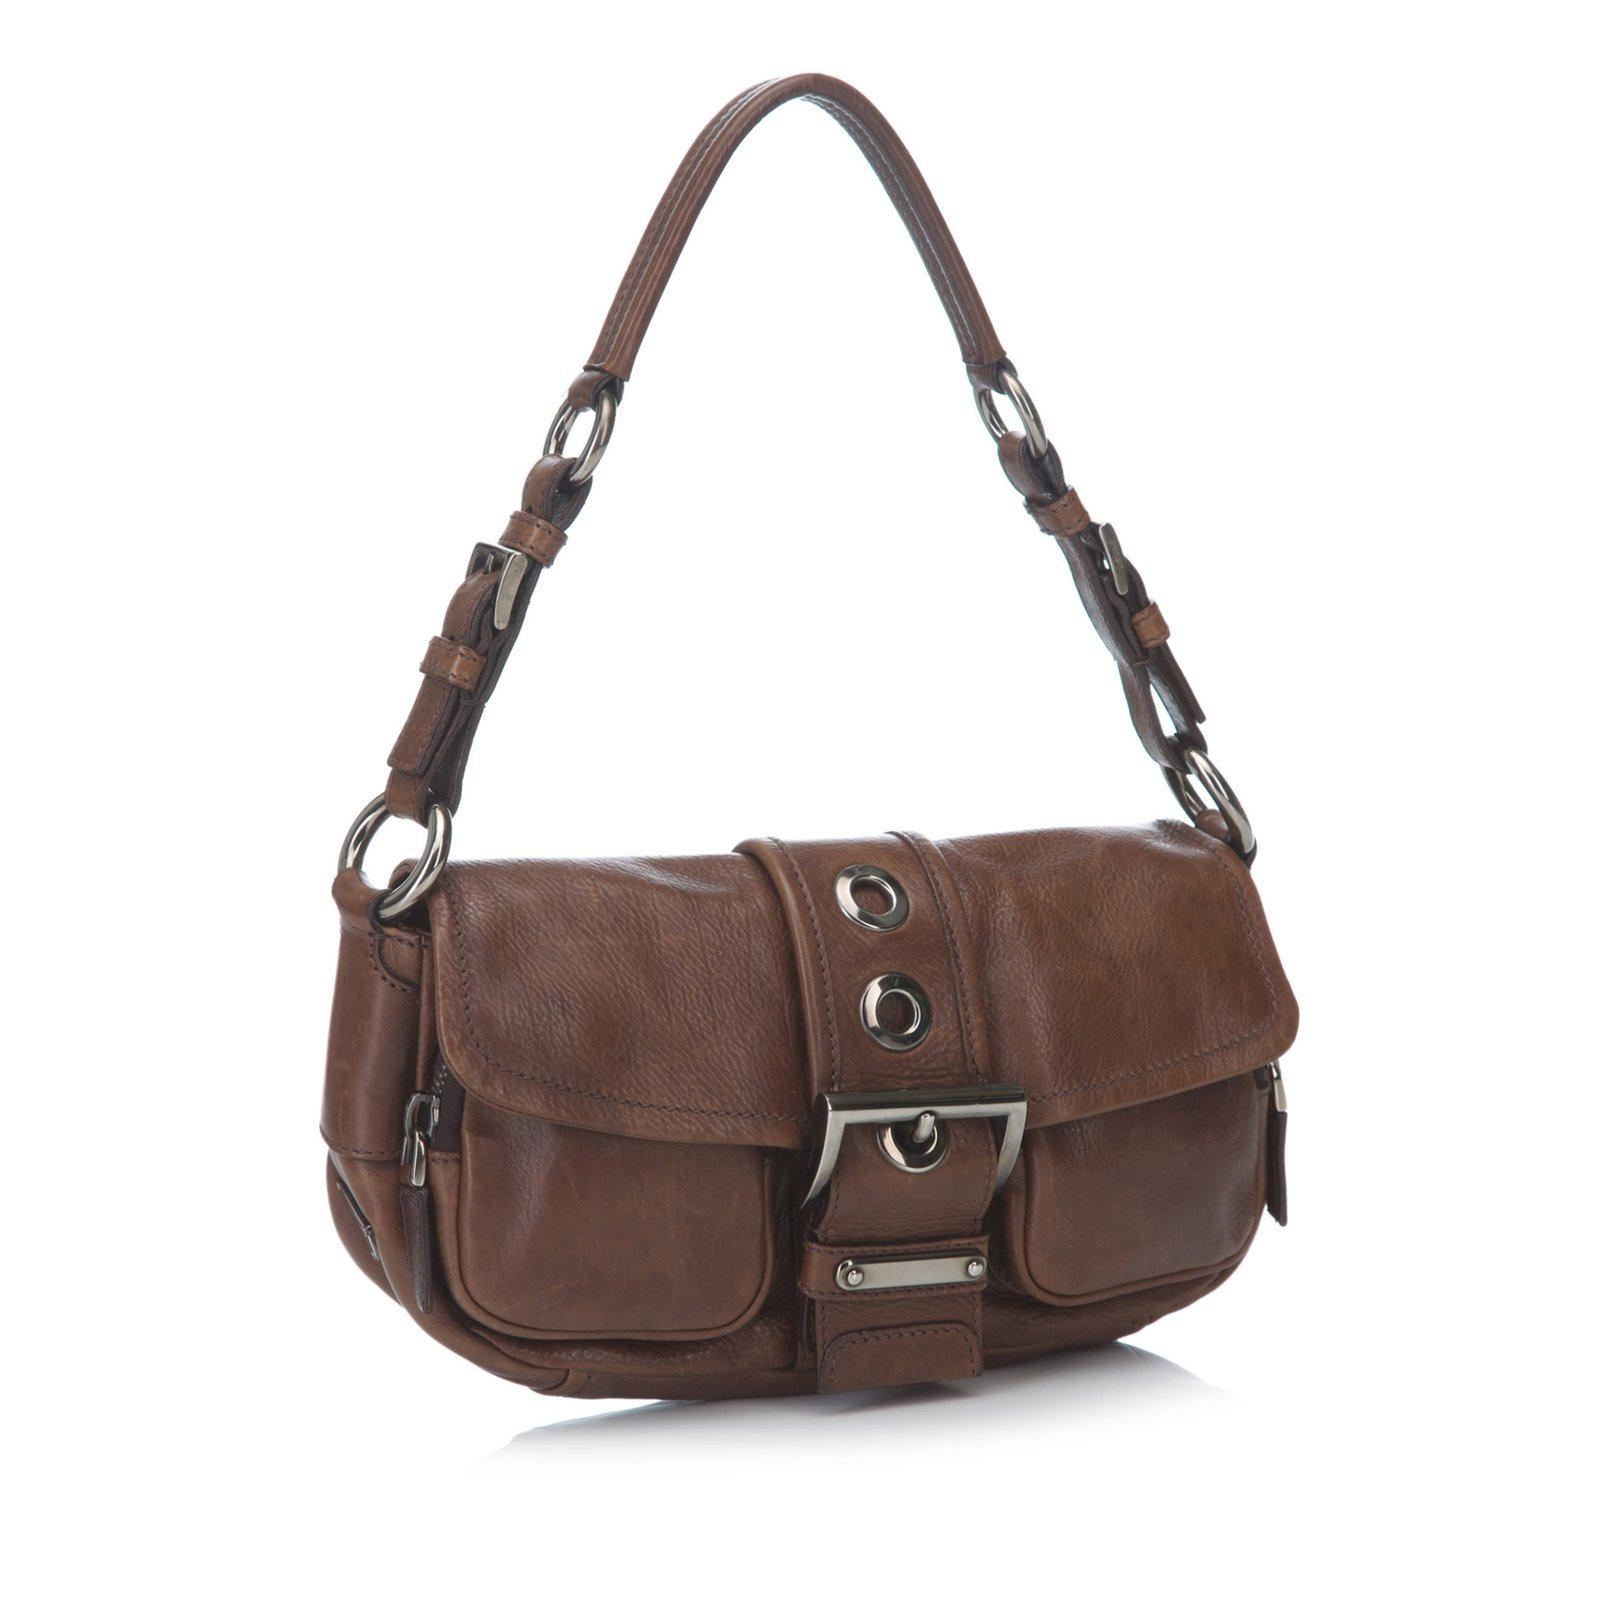 8bc32e55612c Prada Leather Shoulder Bag Handbags Leather